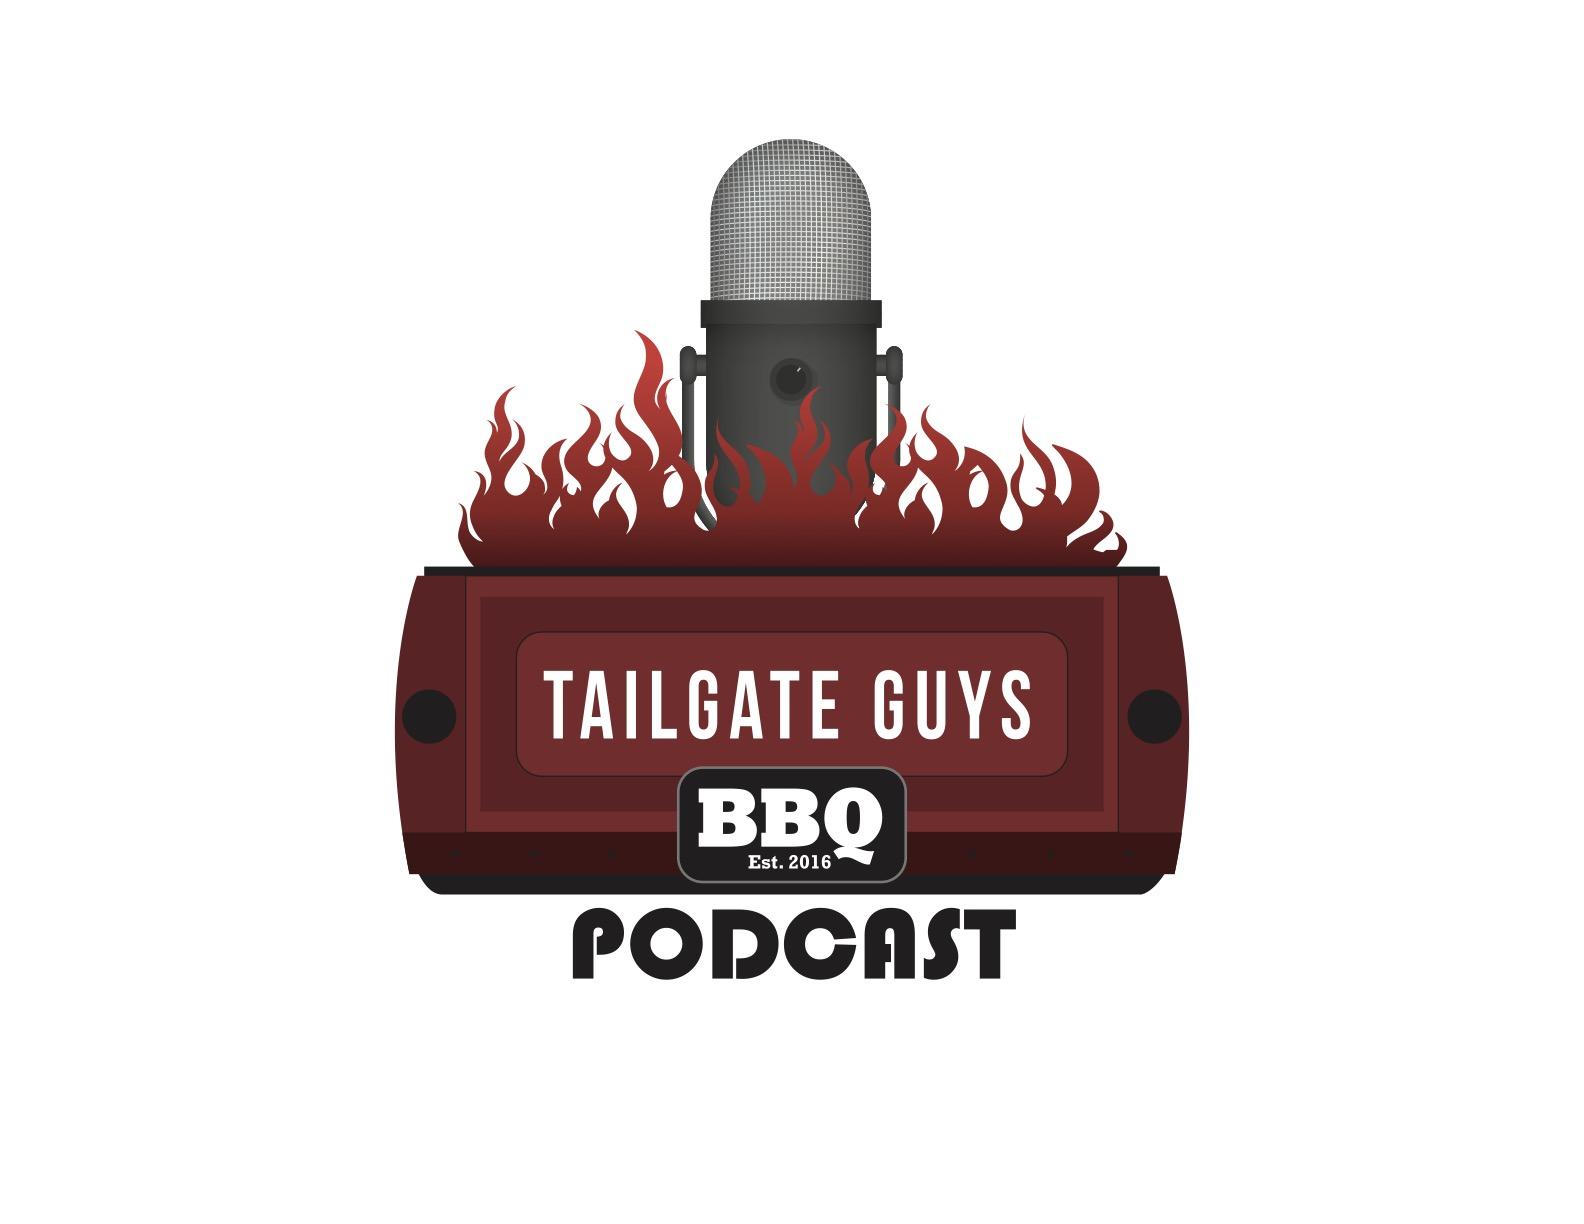 Tailgate Guys BBQ Podcast